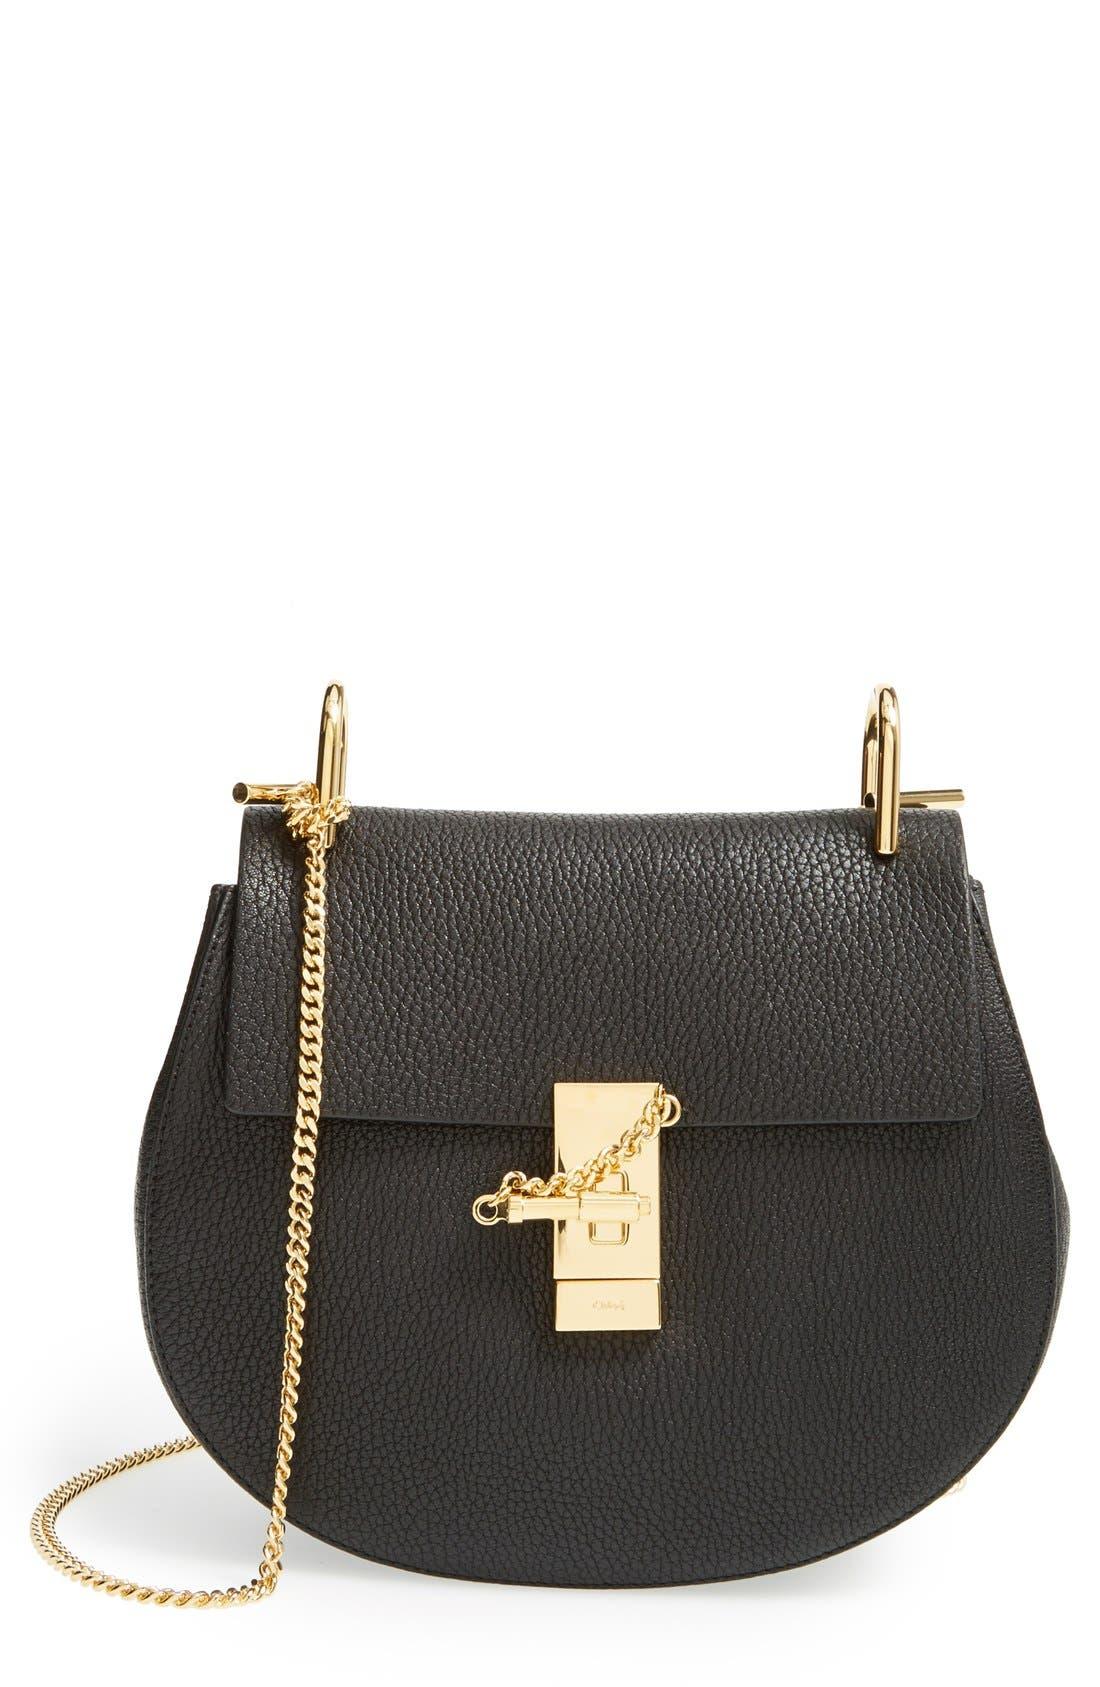 Drew Leather Shoulder Bag,                             Main thumbnail 1, color,                             BLACK GOLD HRDWRE